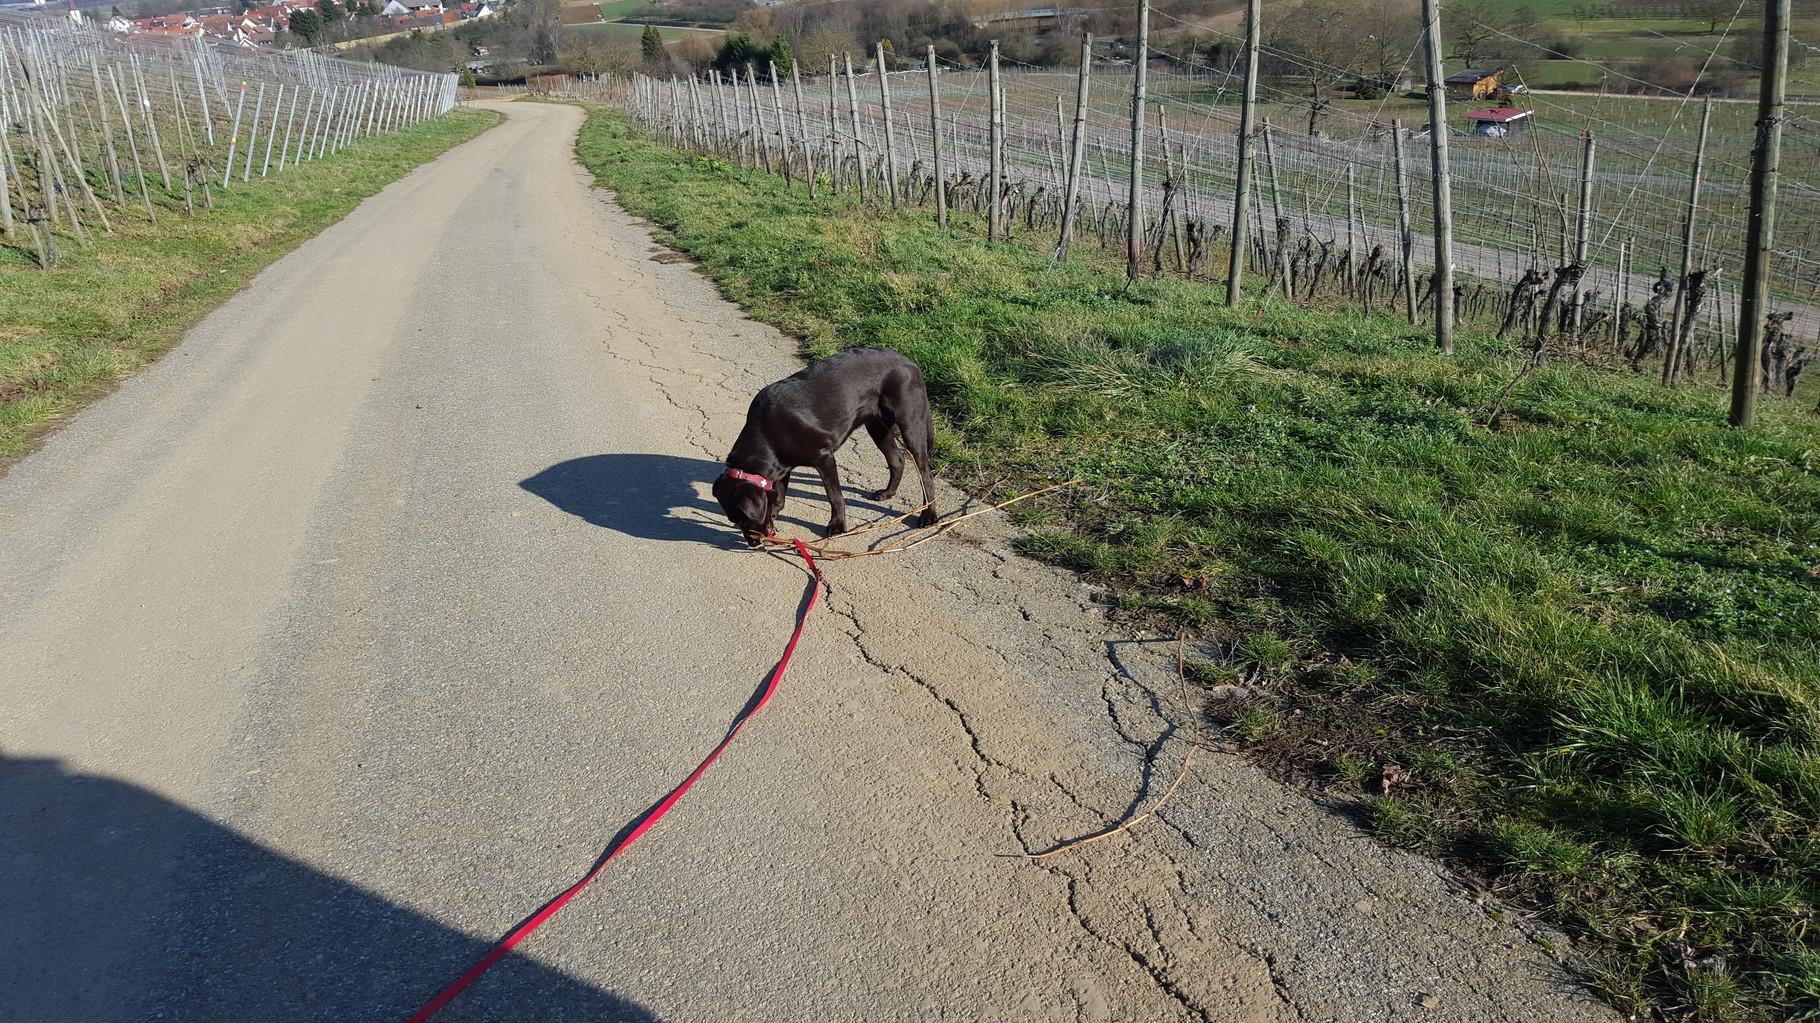 Spaziergang durch den Weinberg